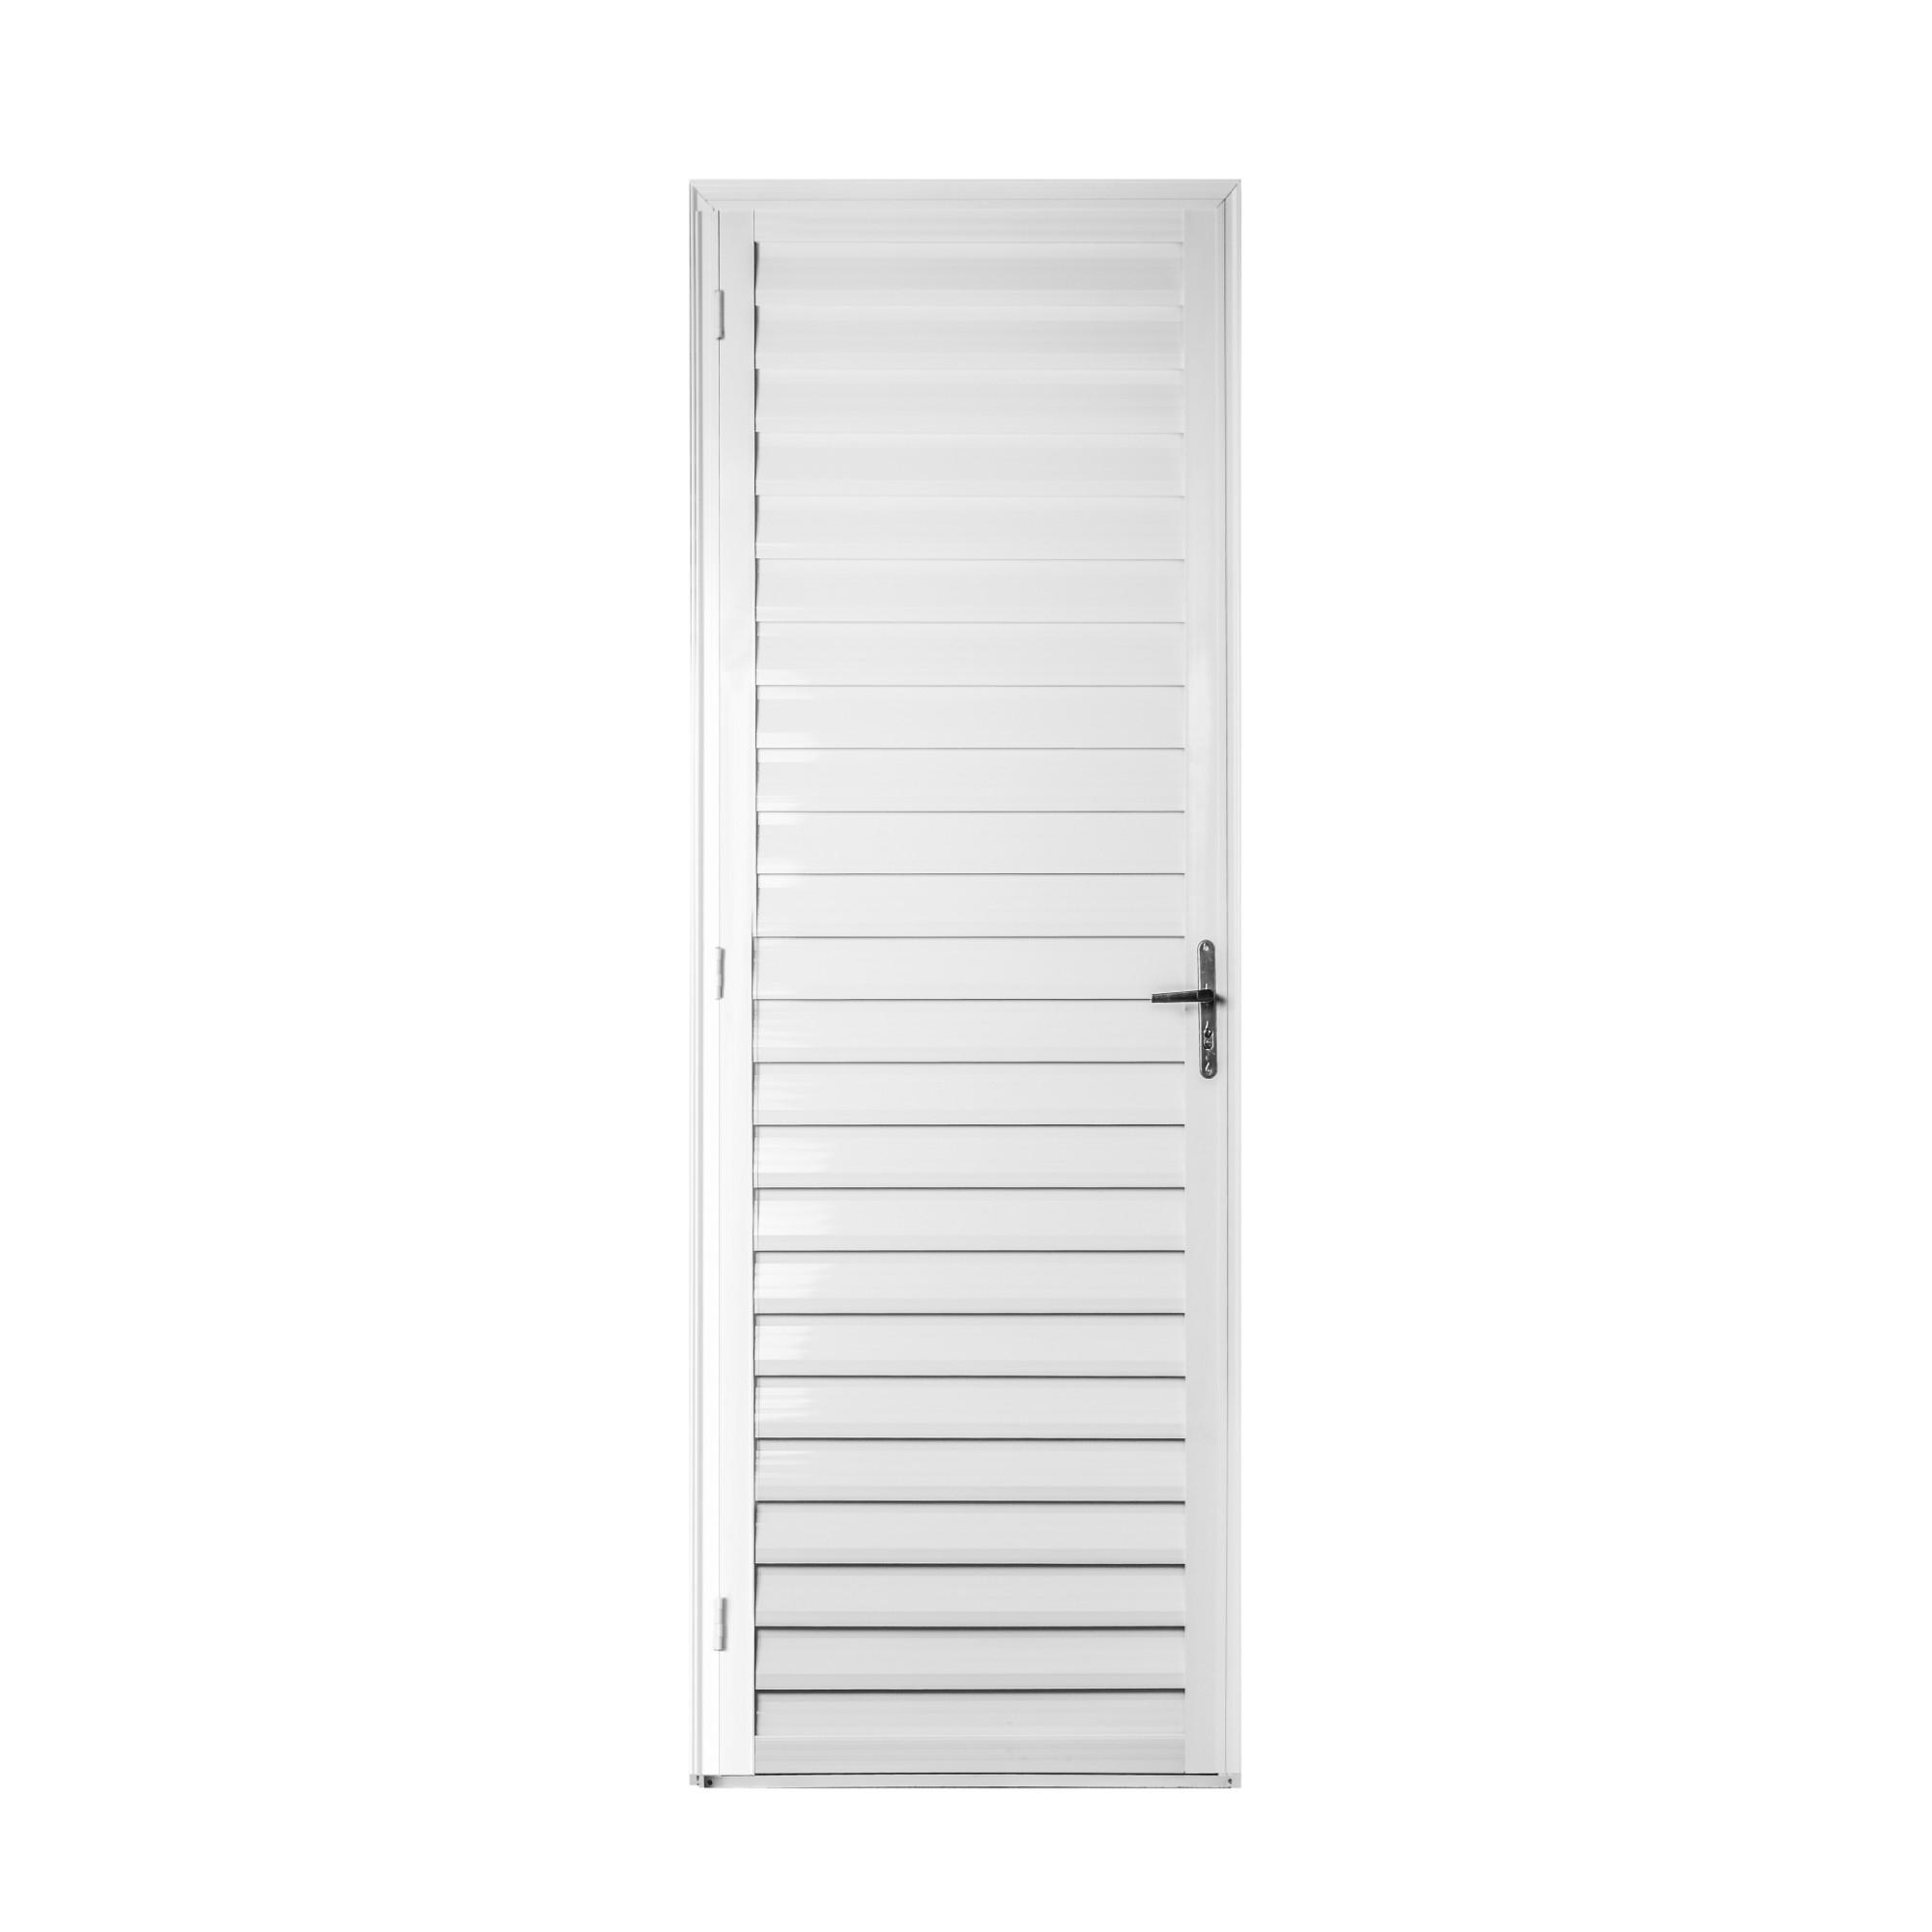 Porta de Abrir de Aluminio 210 x 70 cm Lado Direito - 911550 - Aluvid